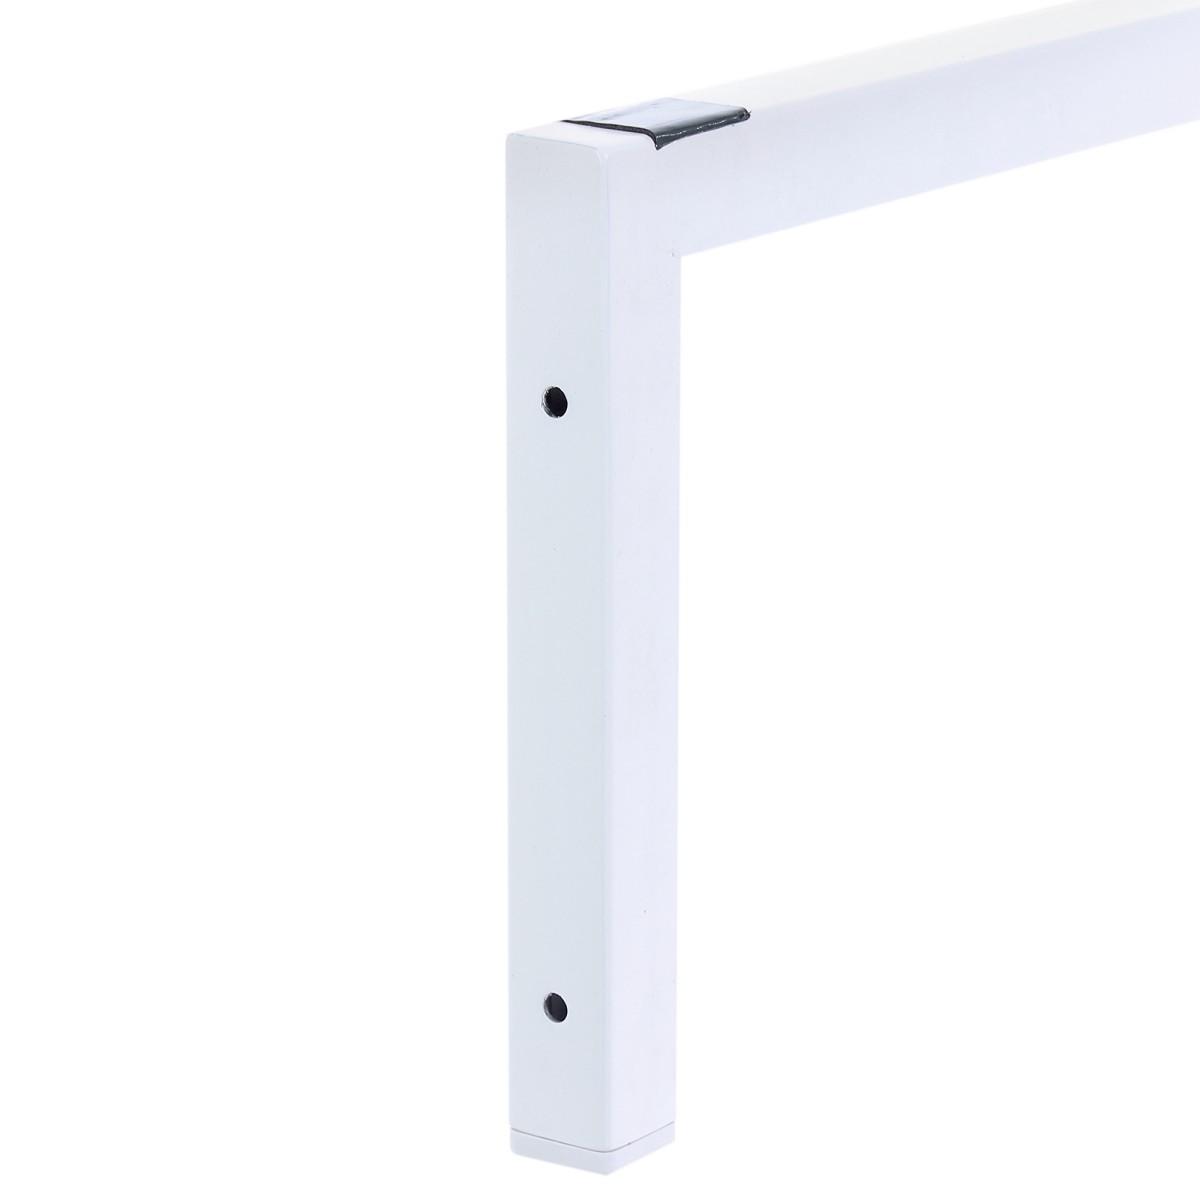 Кронейн Г-Образный 450Х200 Цвет Белый 2